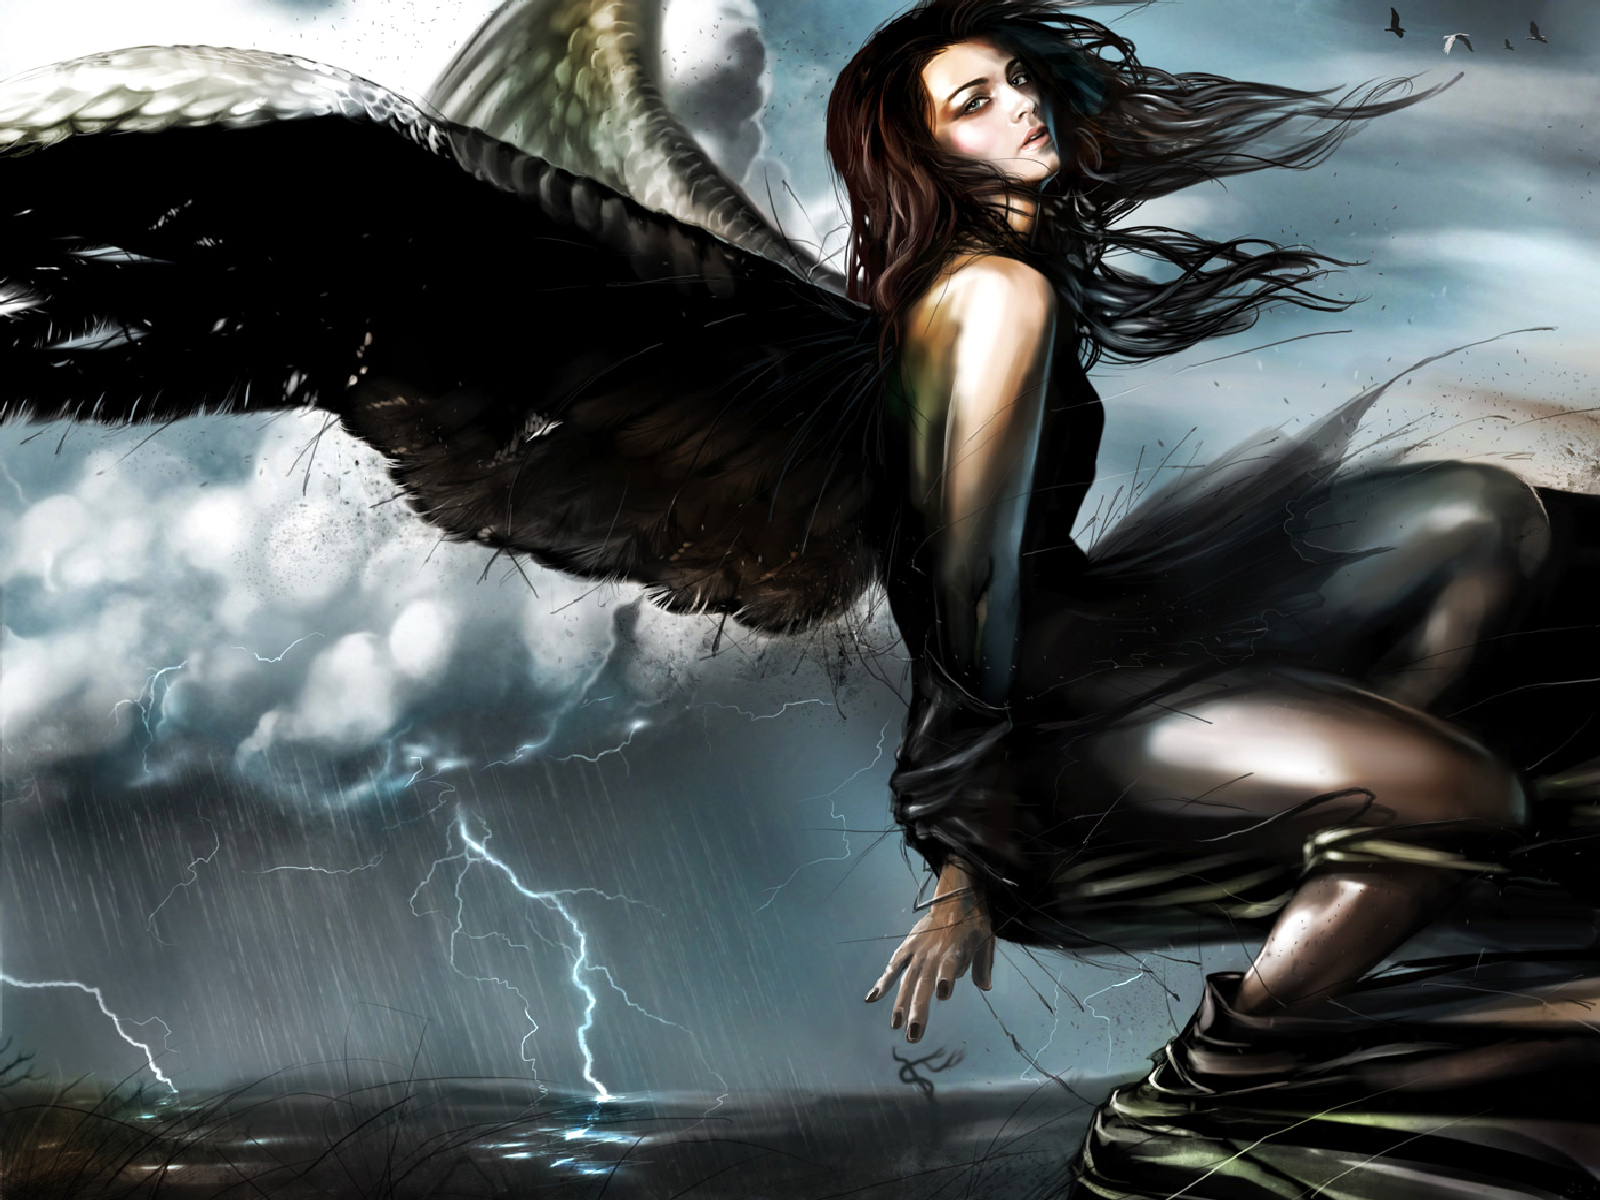 Обои Фантастика, крылья, ангел, fantasy, девушка. обои 1280x960